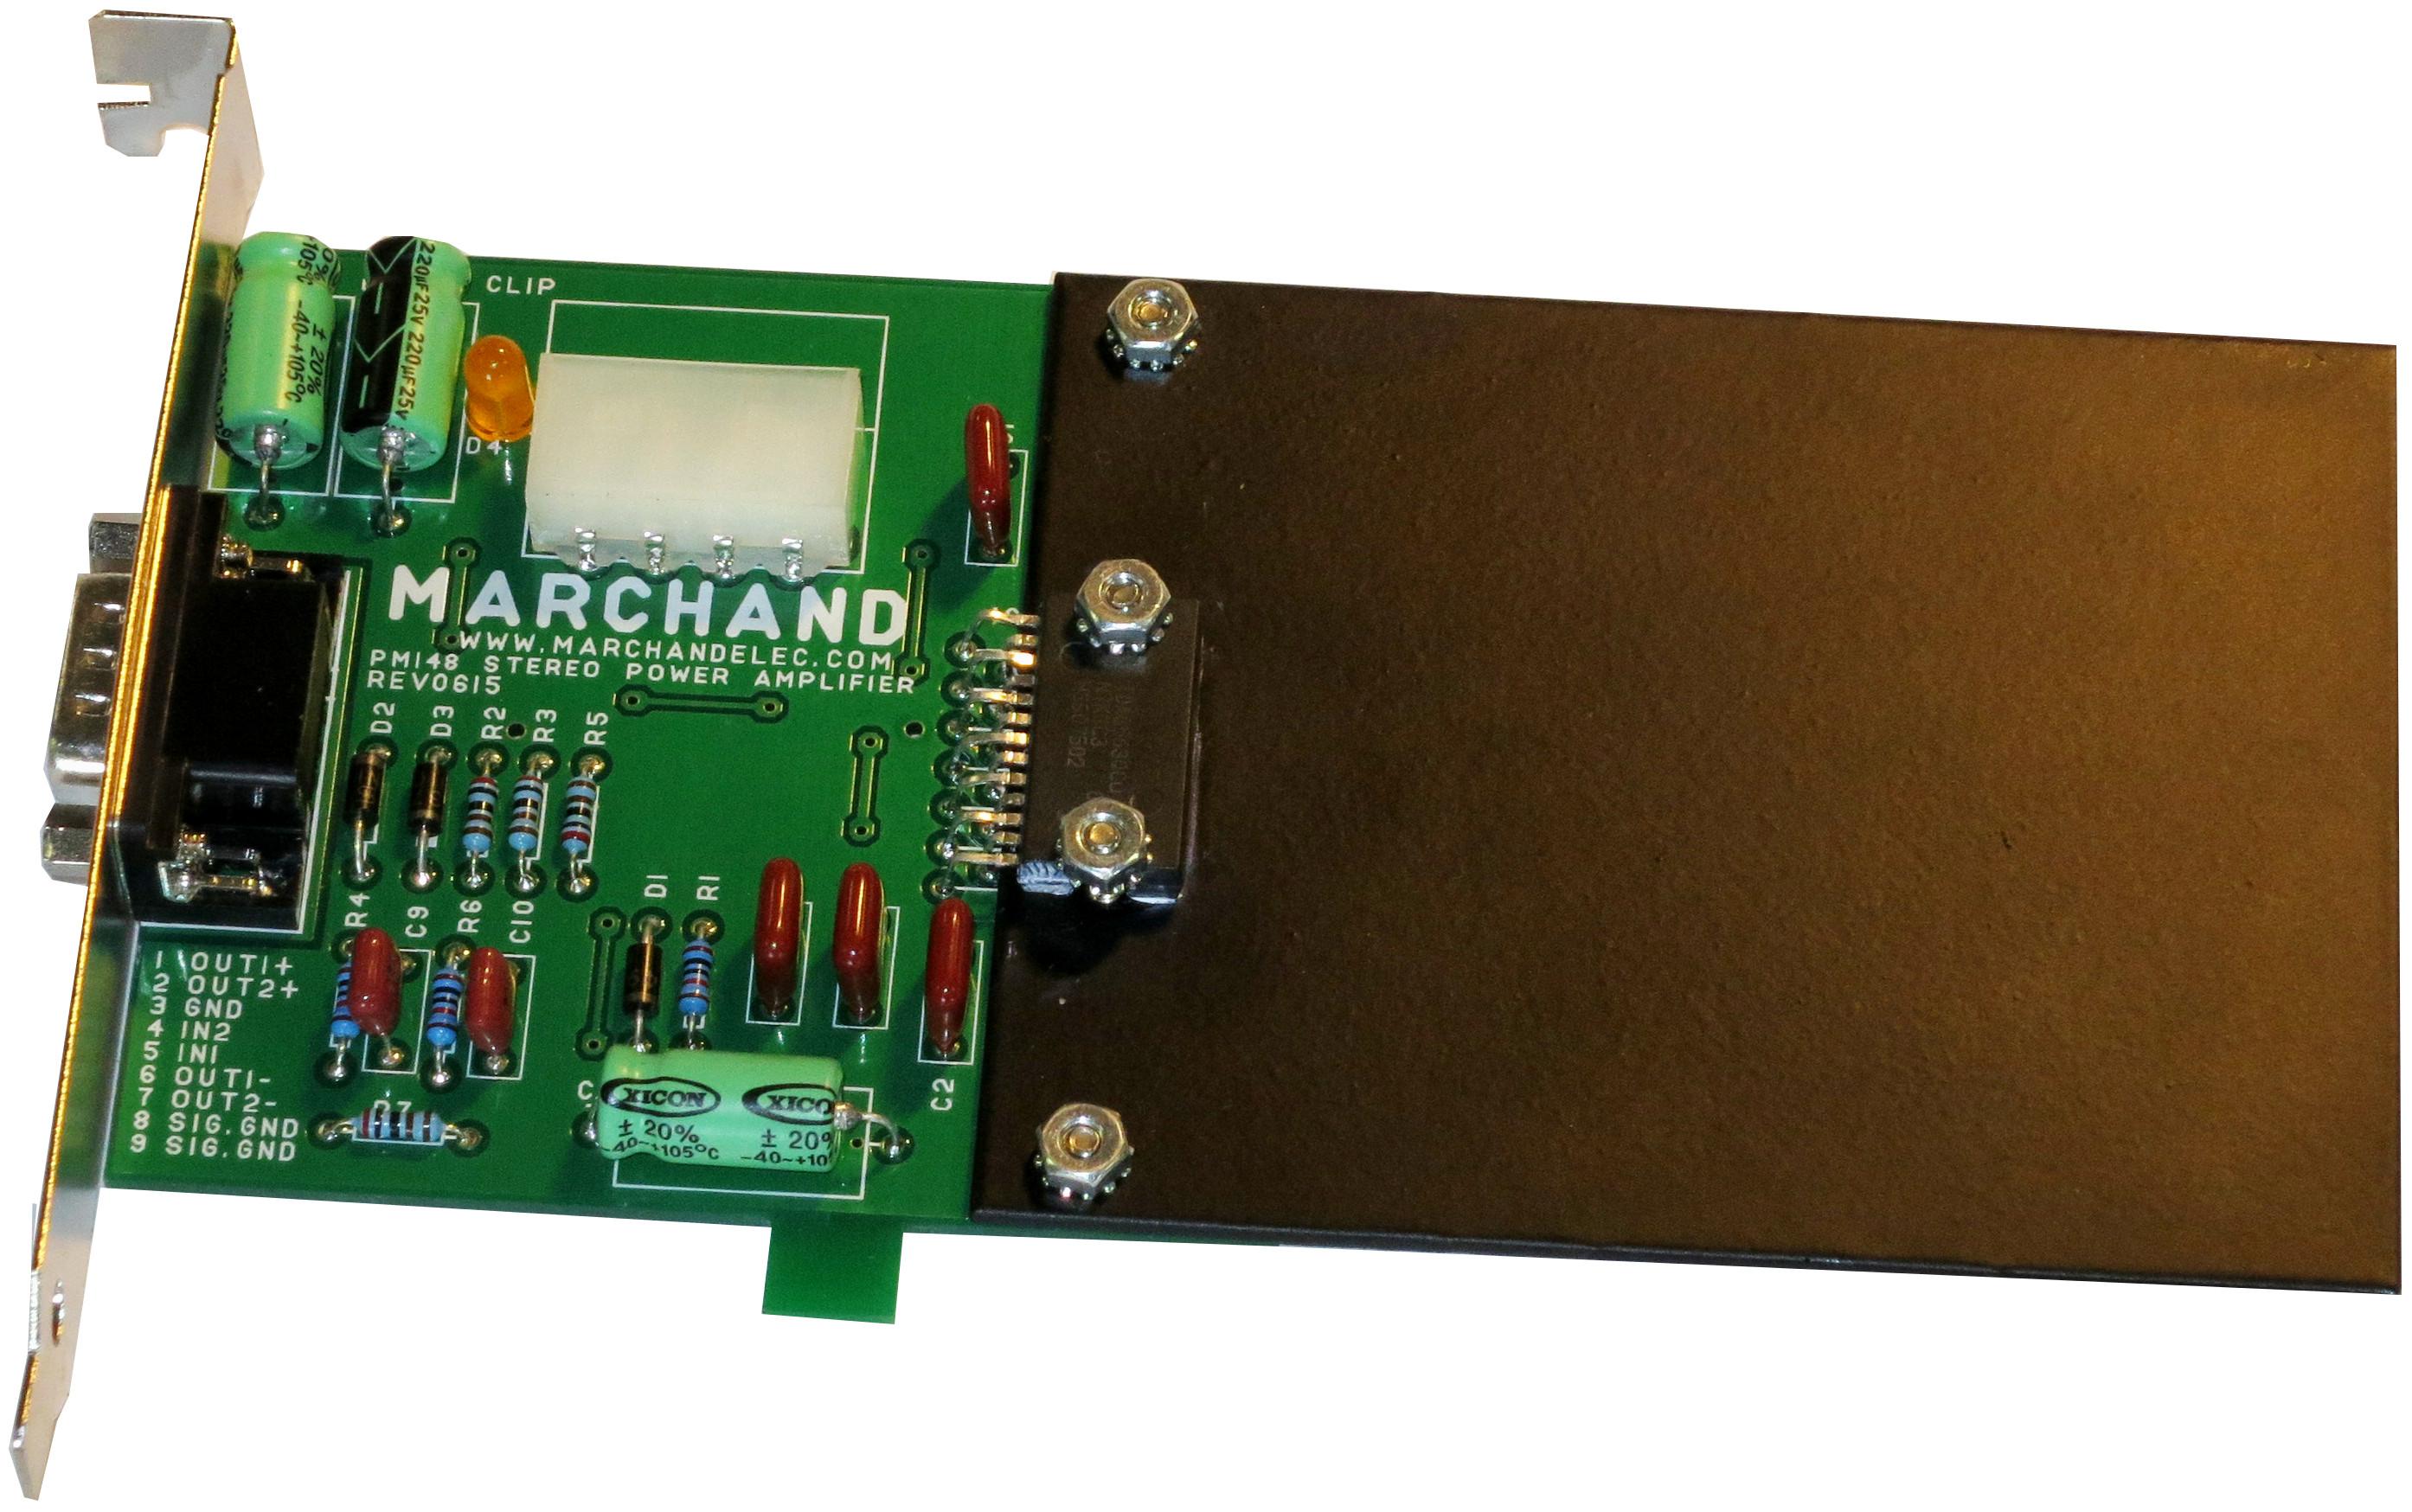 Audio Pc Internal 2x12 Watt Stereo Amplifier Adapter For